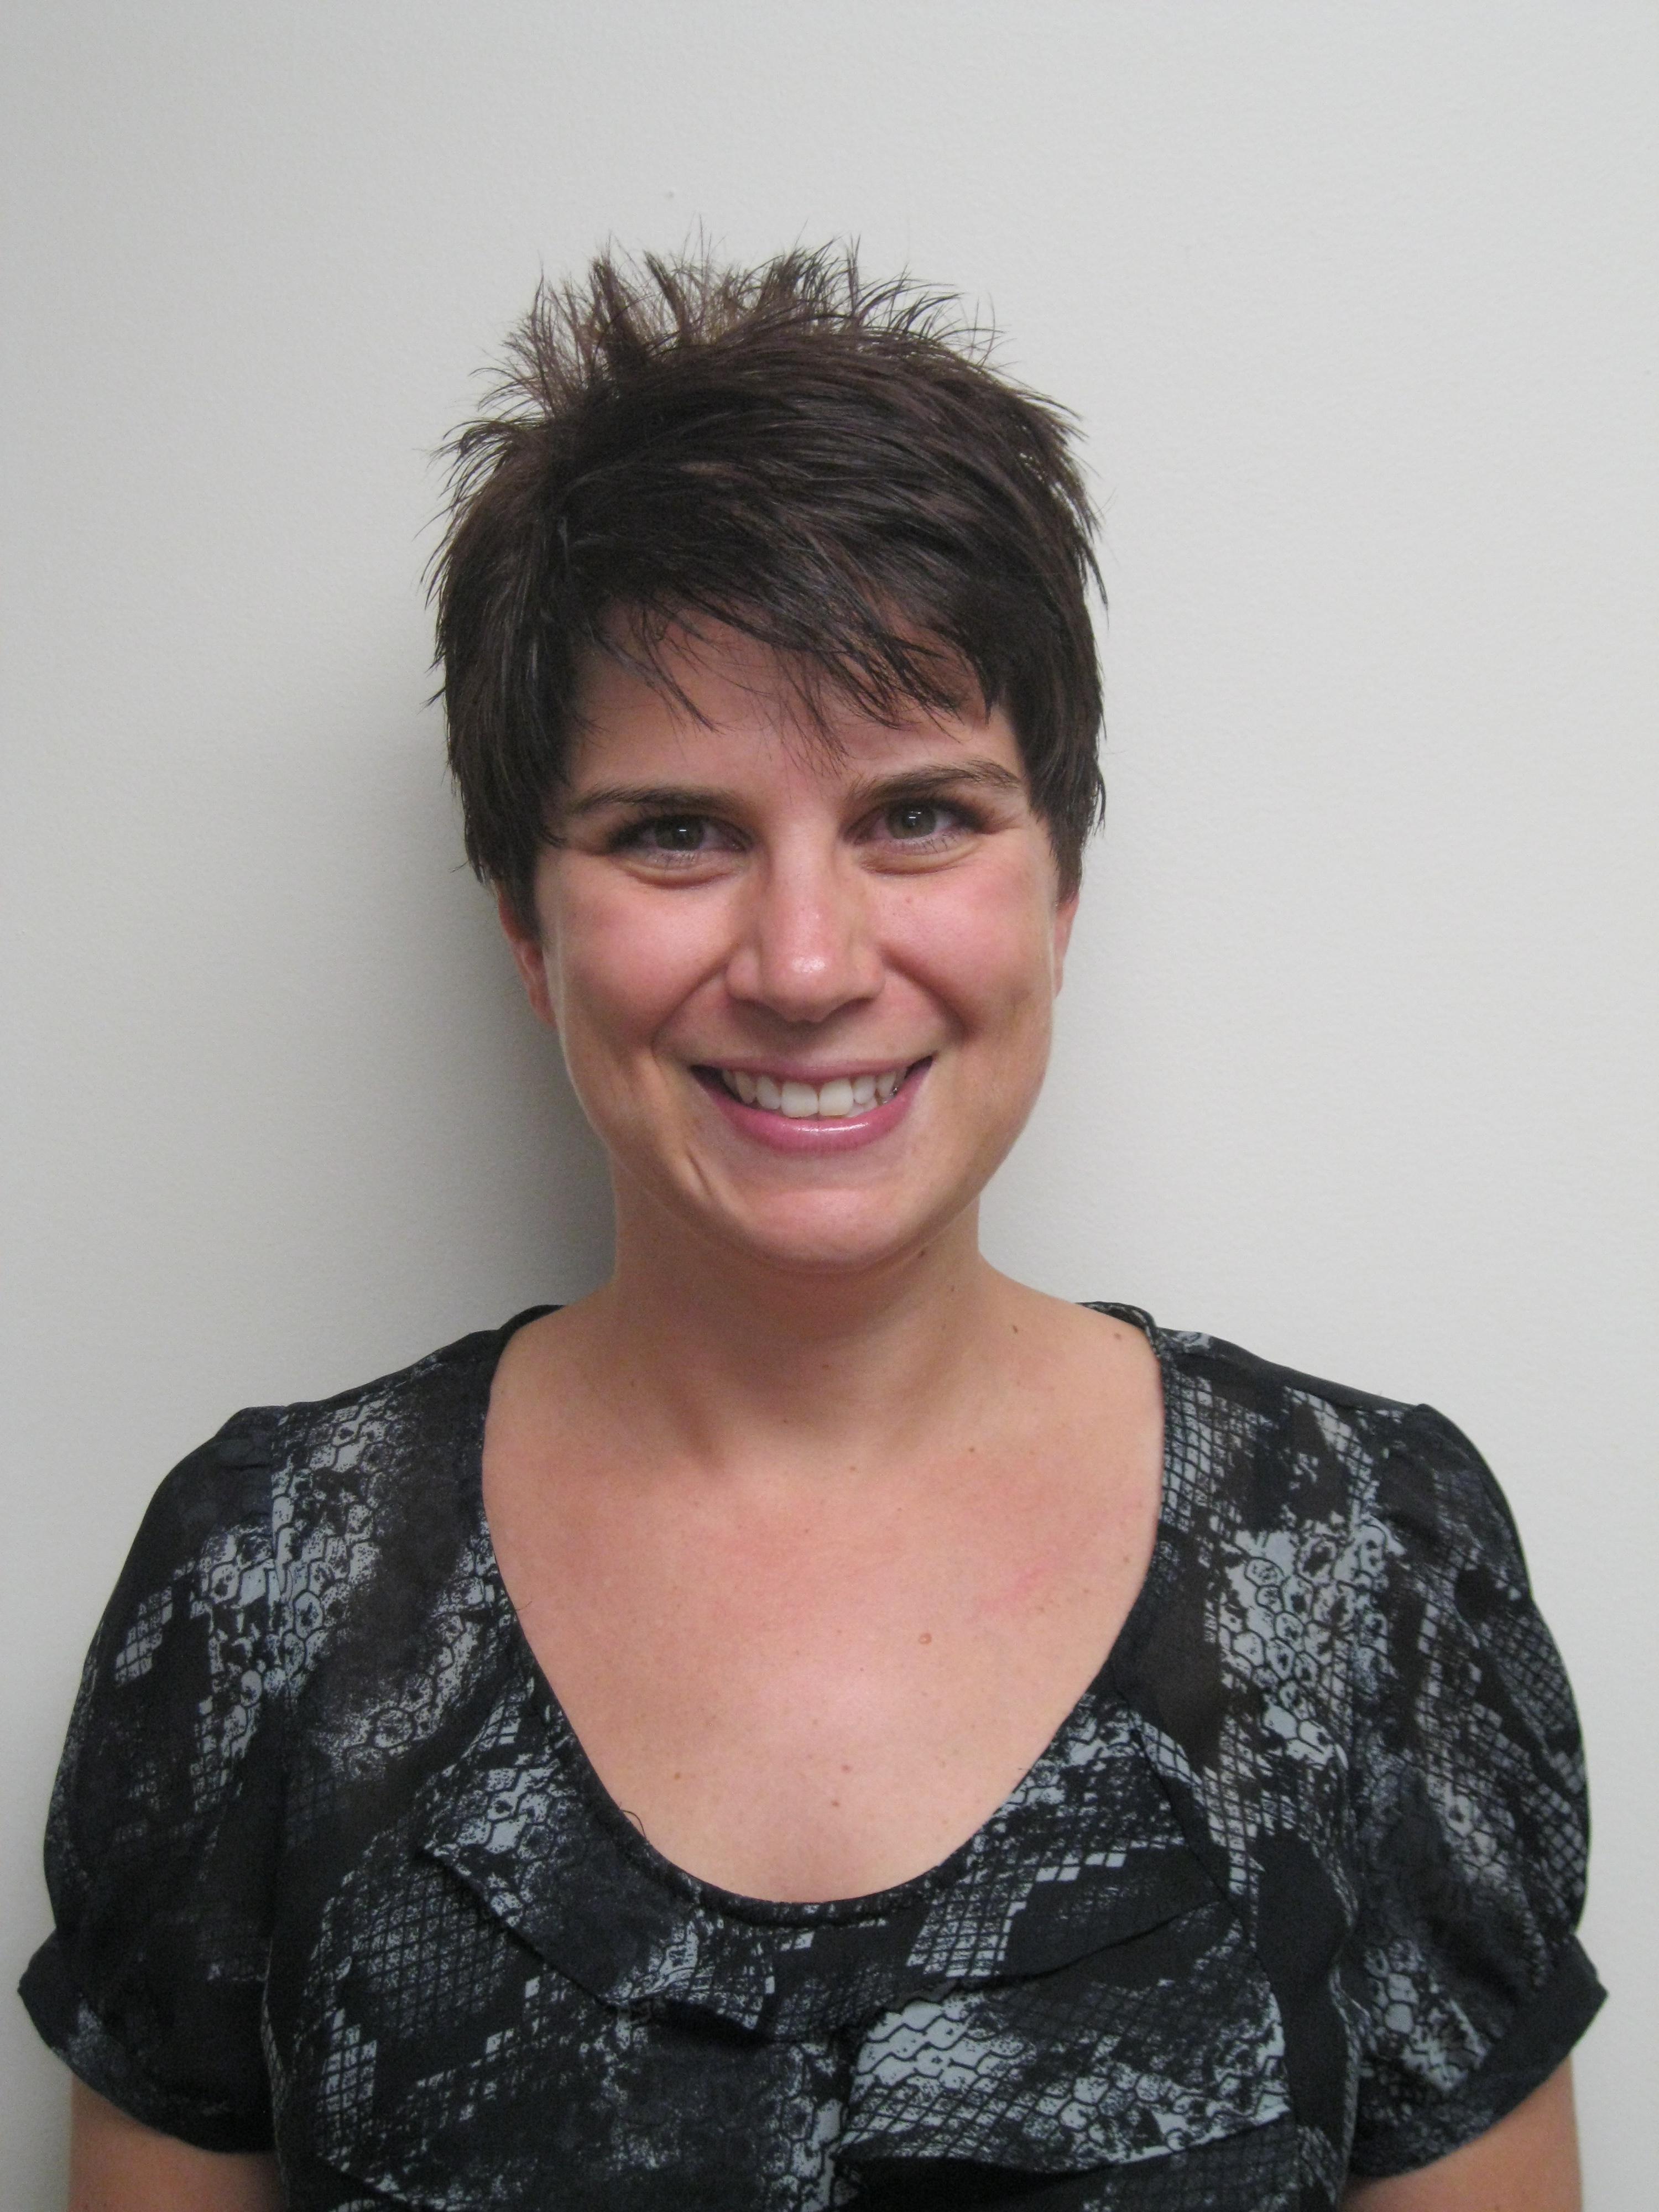 Employee Spotlight: Michelle Everetts